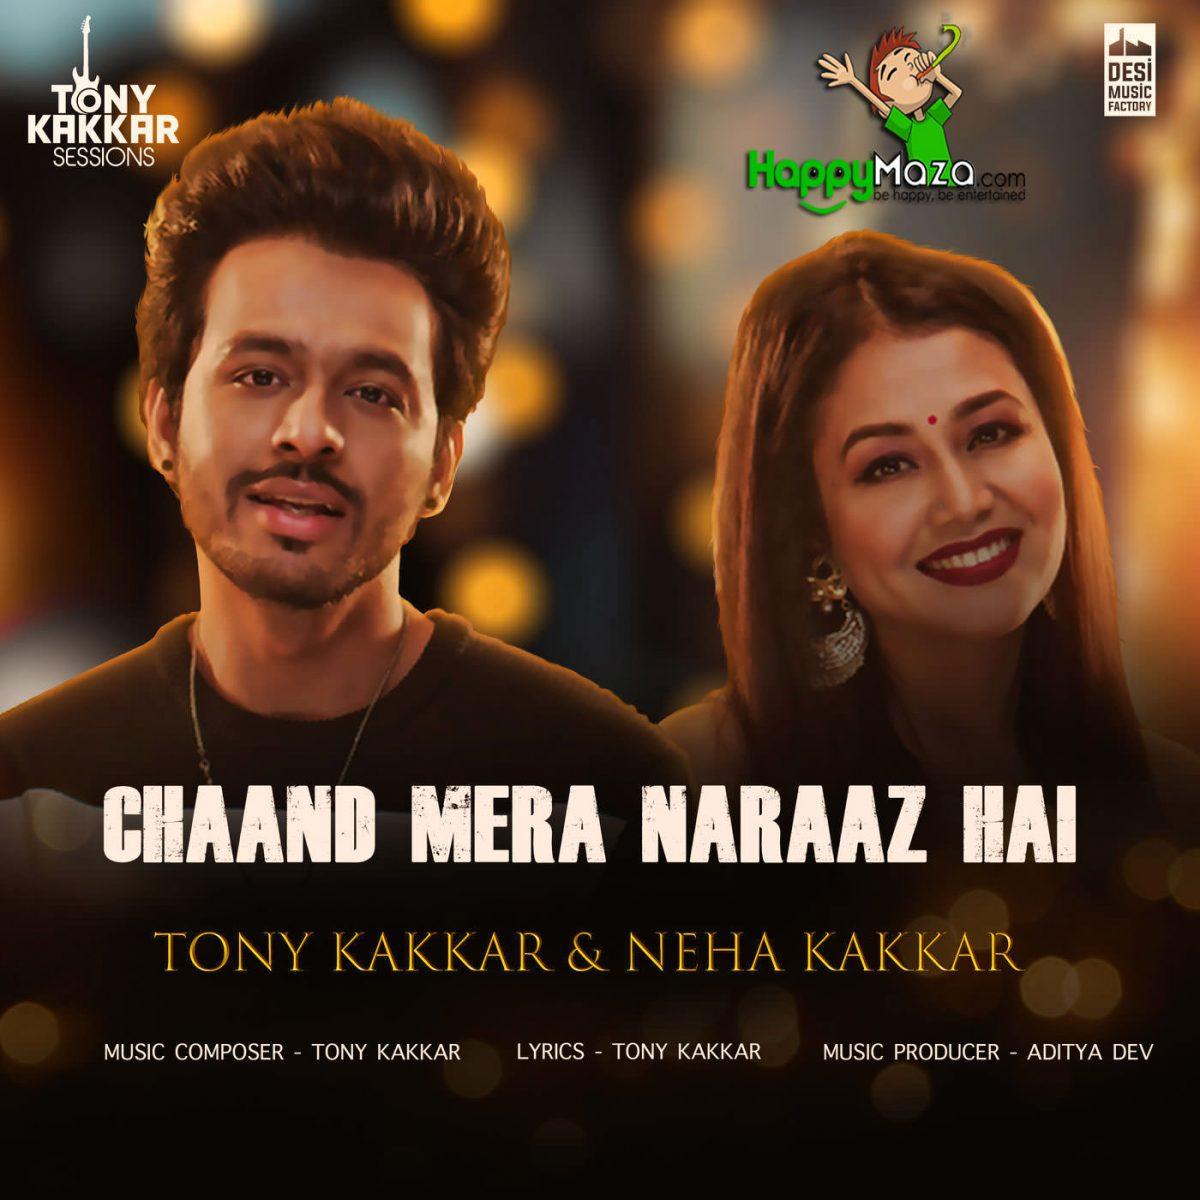 Chaand Mera Naraaz Hai Lyrics – Tony Kakkar & Neha Kakkar – 2017